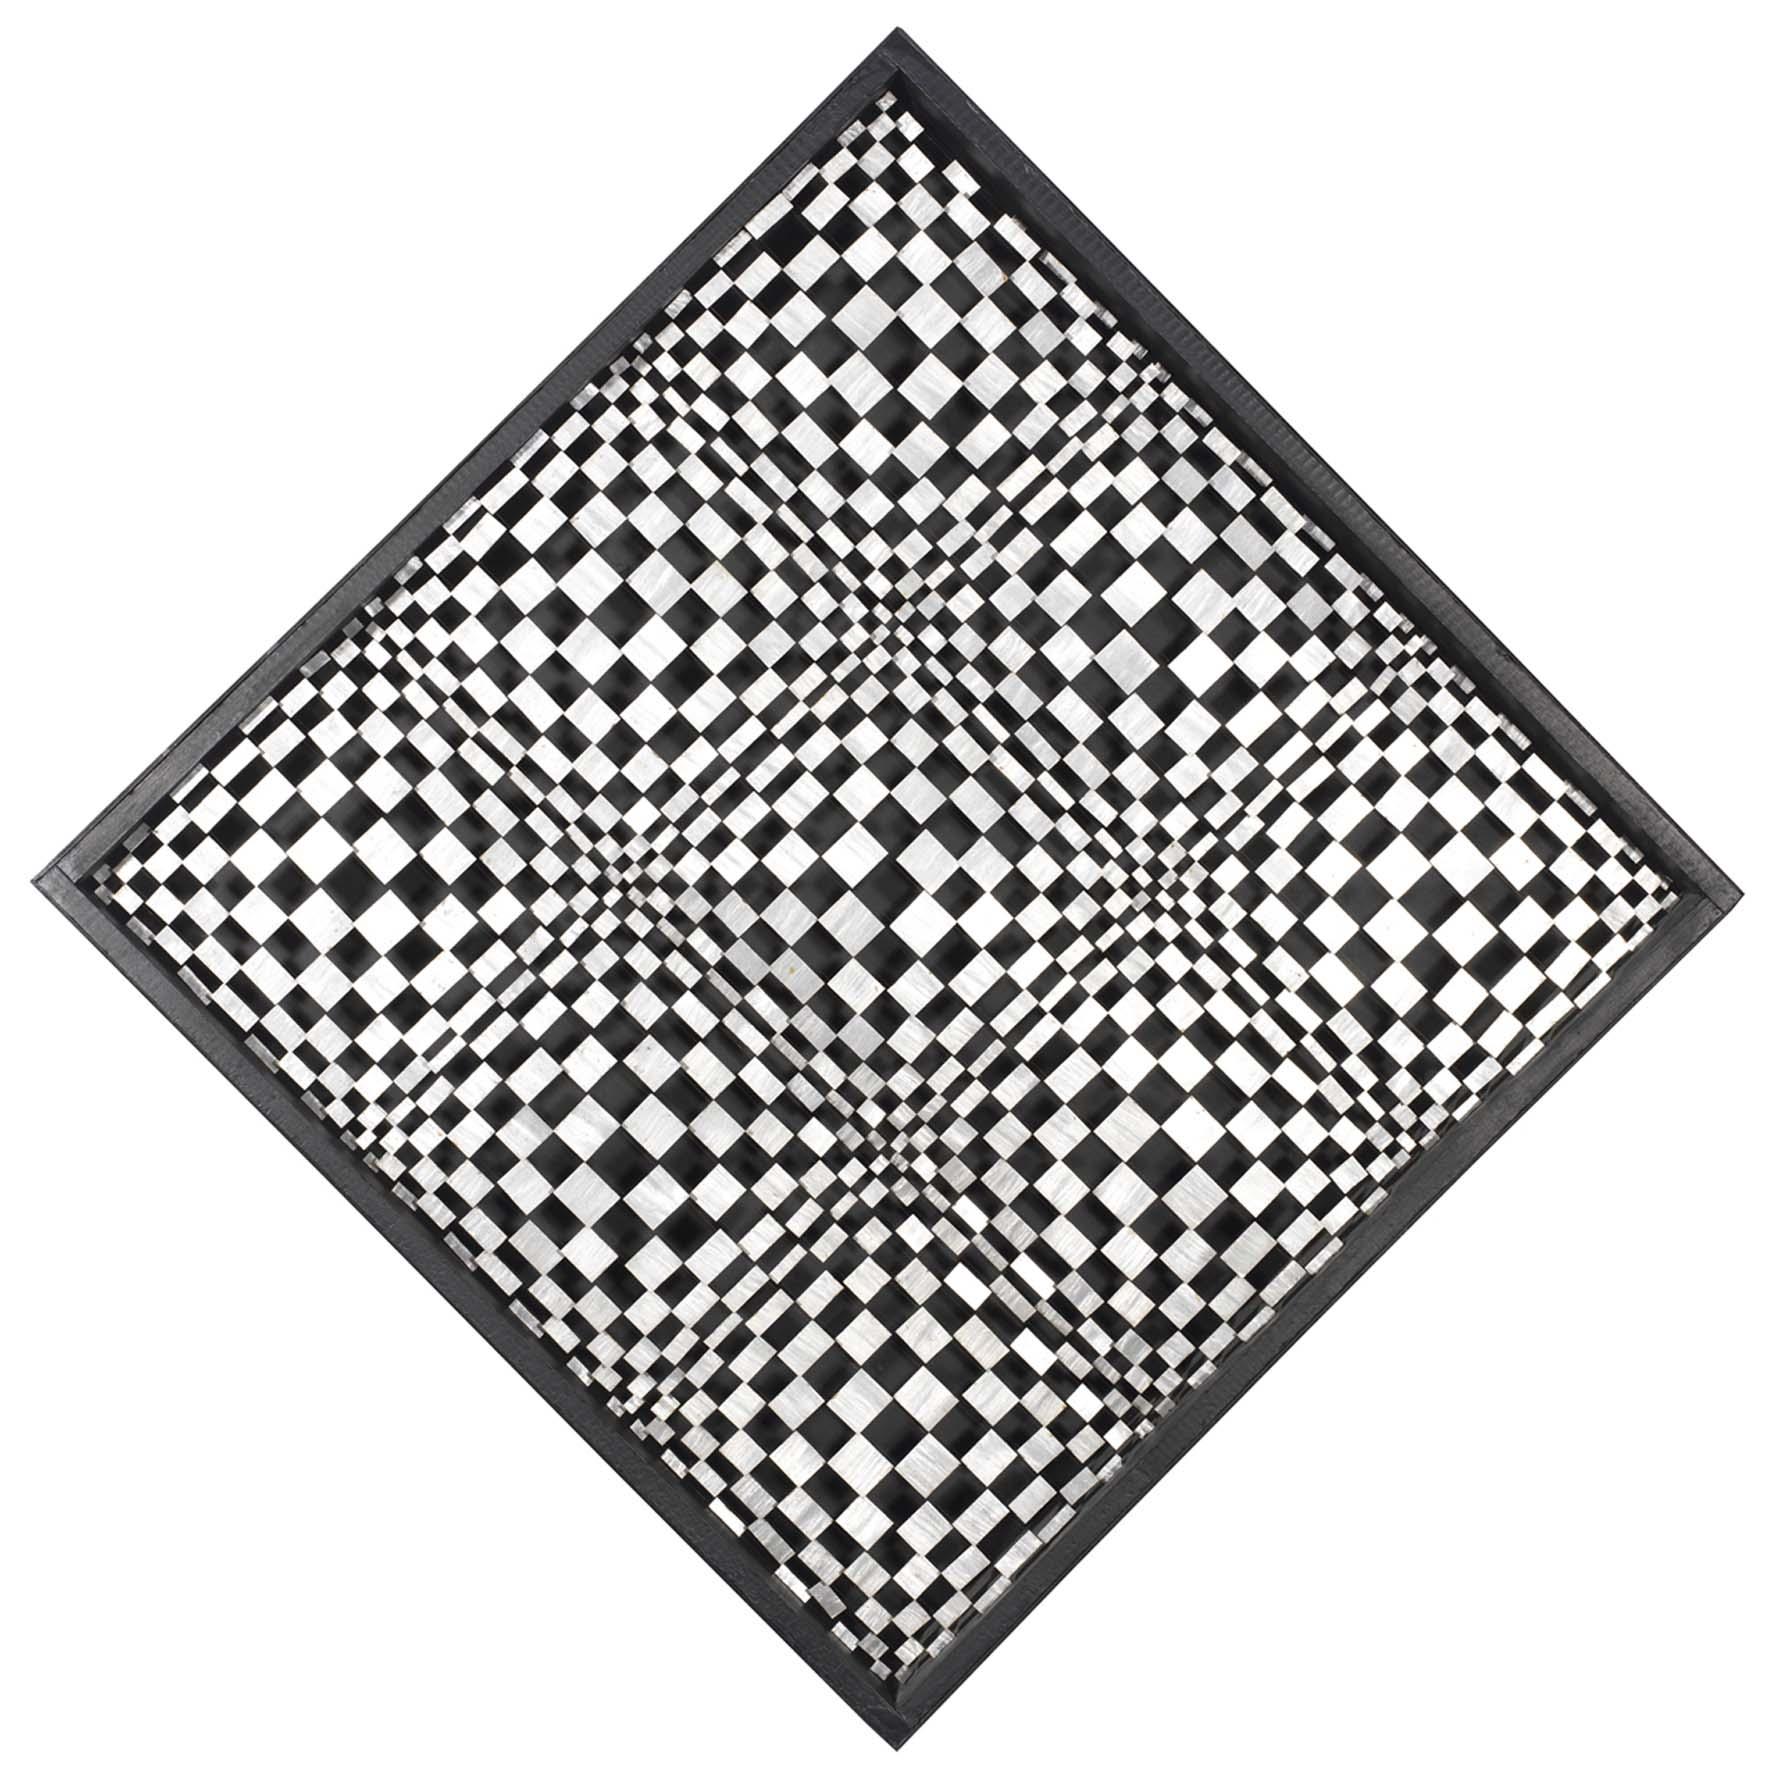 Dadamaino, Oggetto ottico dinamico indeterminato negativo P.3, 1963-64, plaques d'aluminium sur structure en bois, 133x133 cm